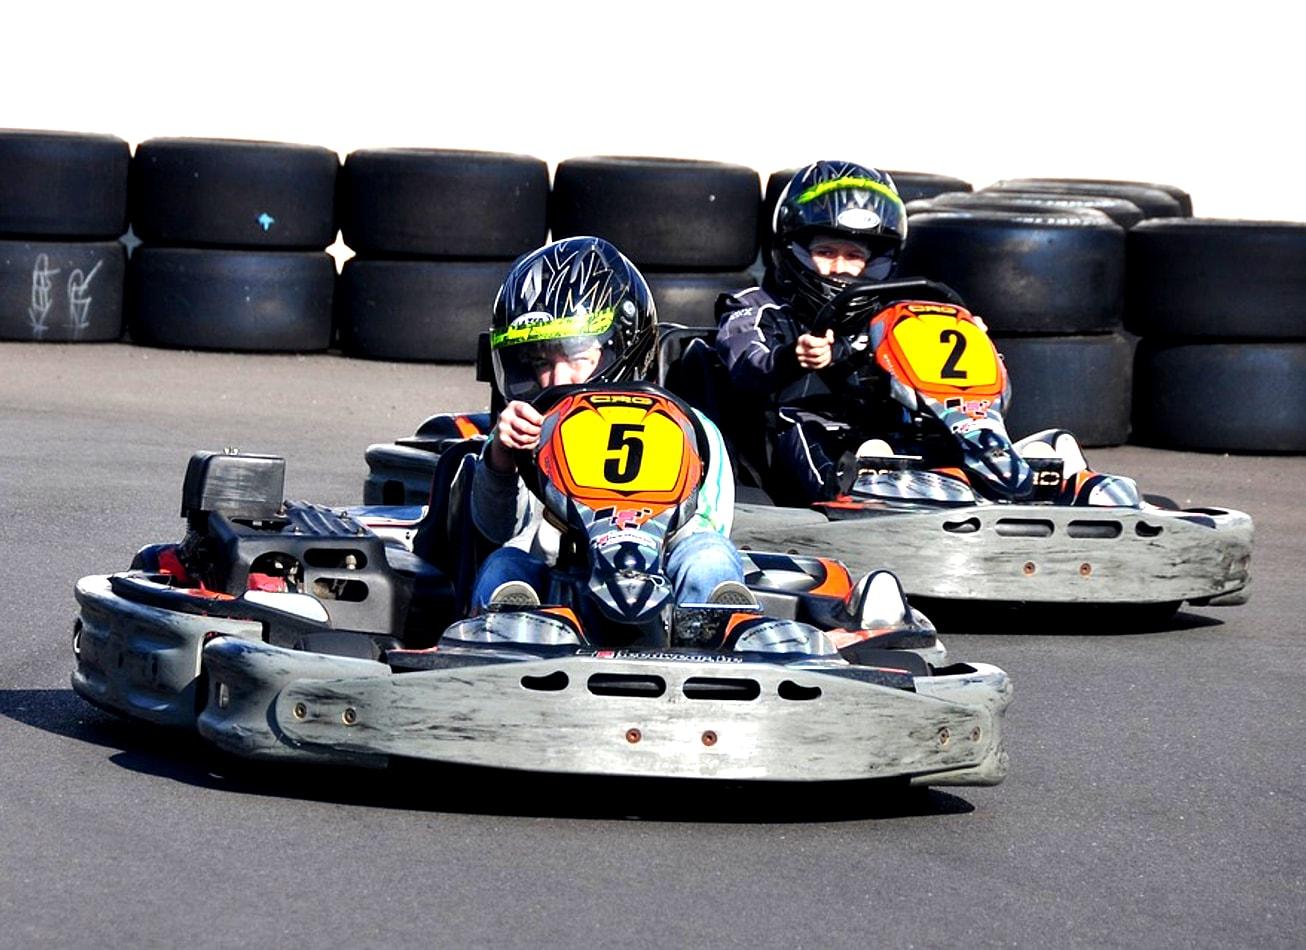 gp karting outdoor exterieur plein air cracovie activites vimigo